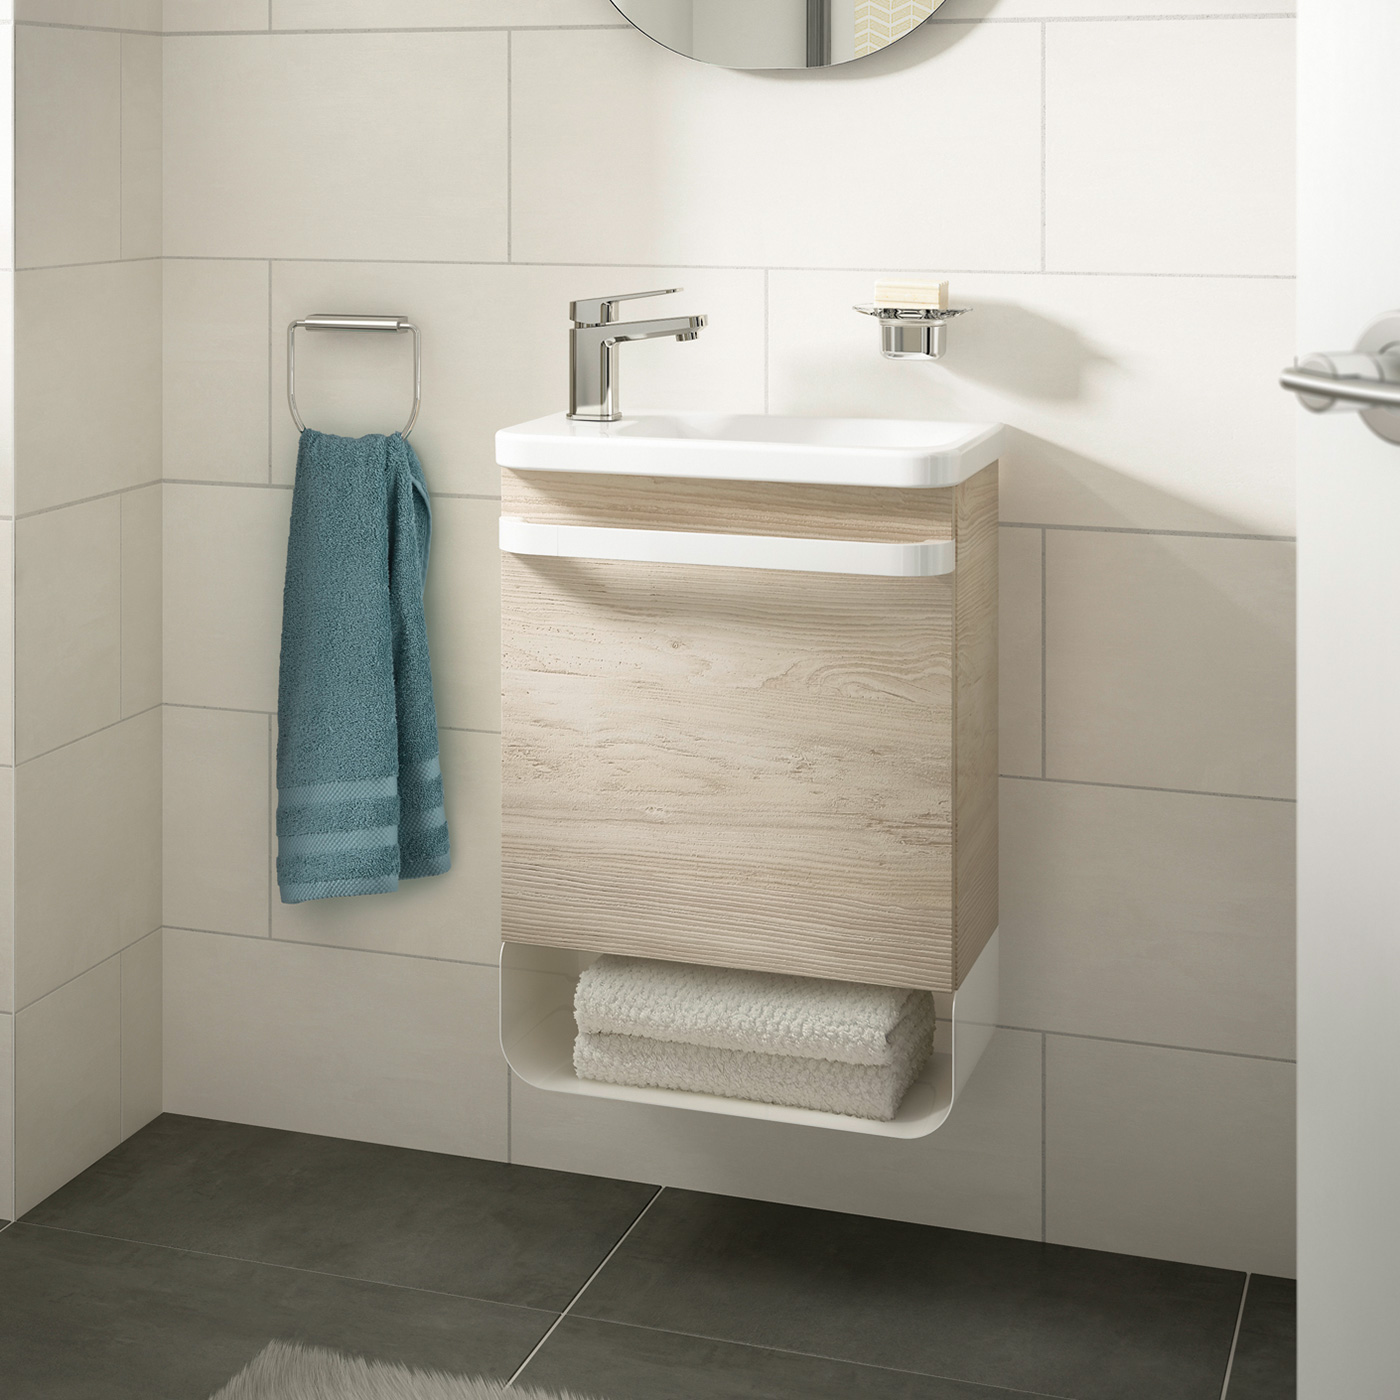 ideal standard tonic ii handwaschbecken 45 cm ablage. Black Bedroom Furniture Sets. Home Design Ideas